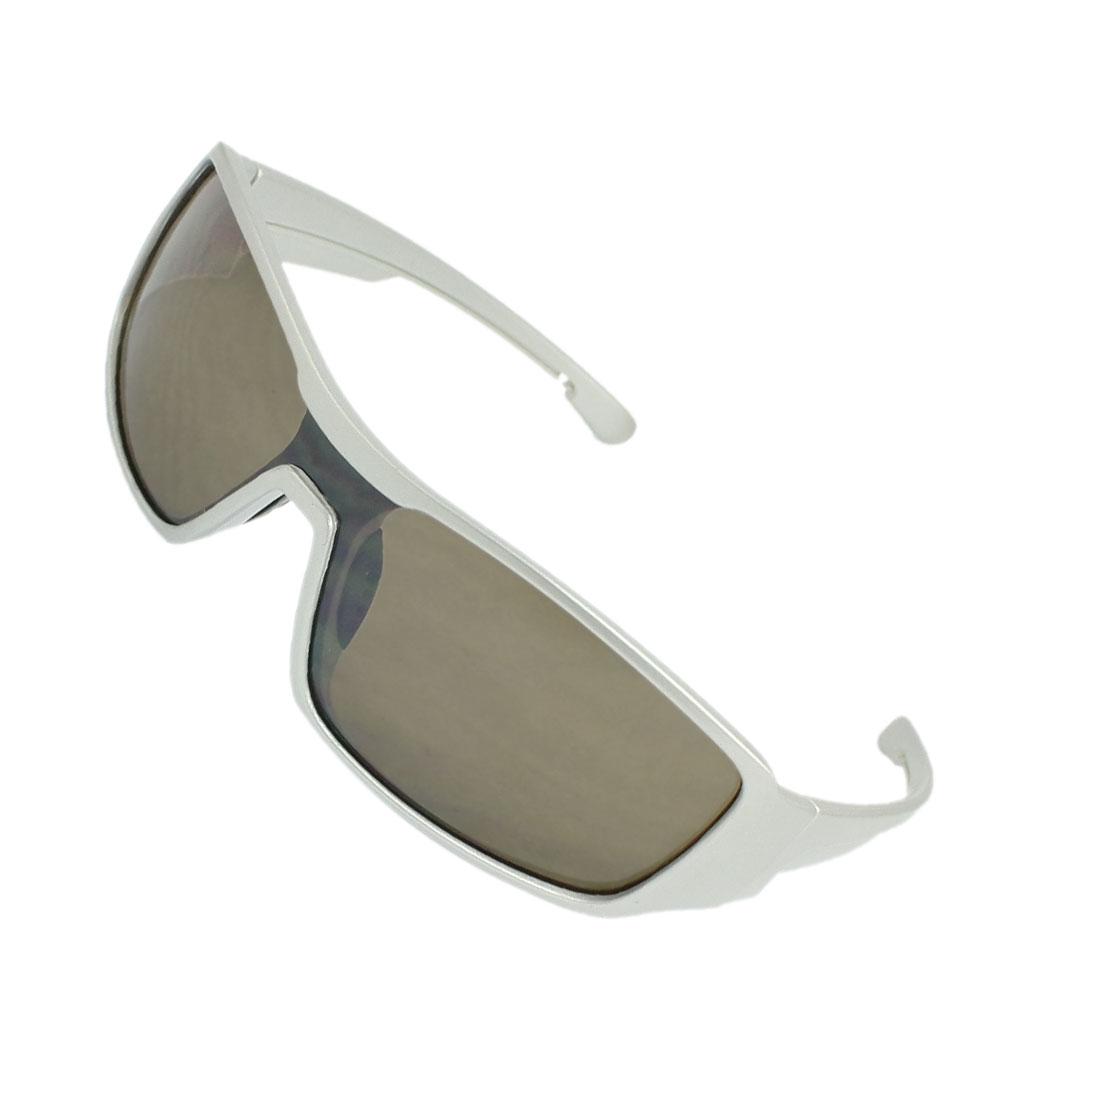 Plastic Wide Arms Rectangle Lens Sunglasses Silver Tone for Men Woman